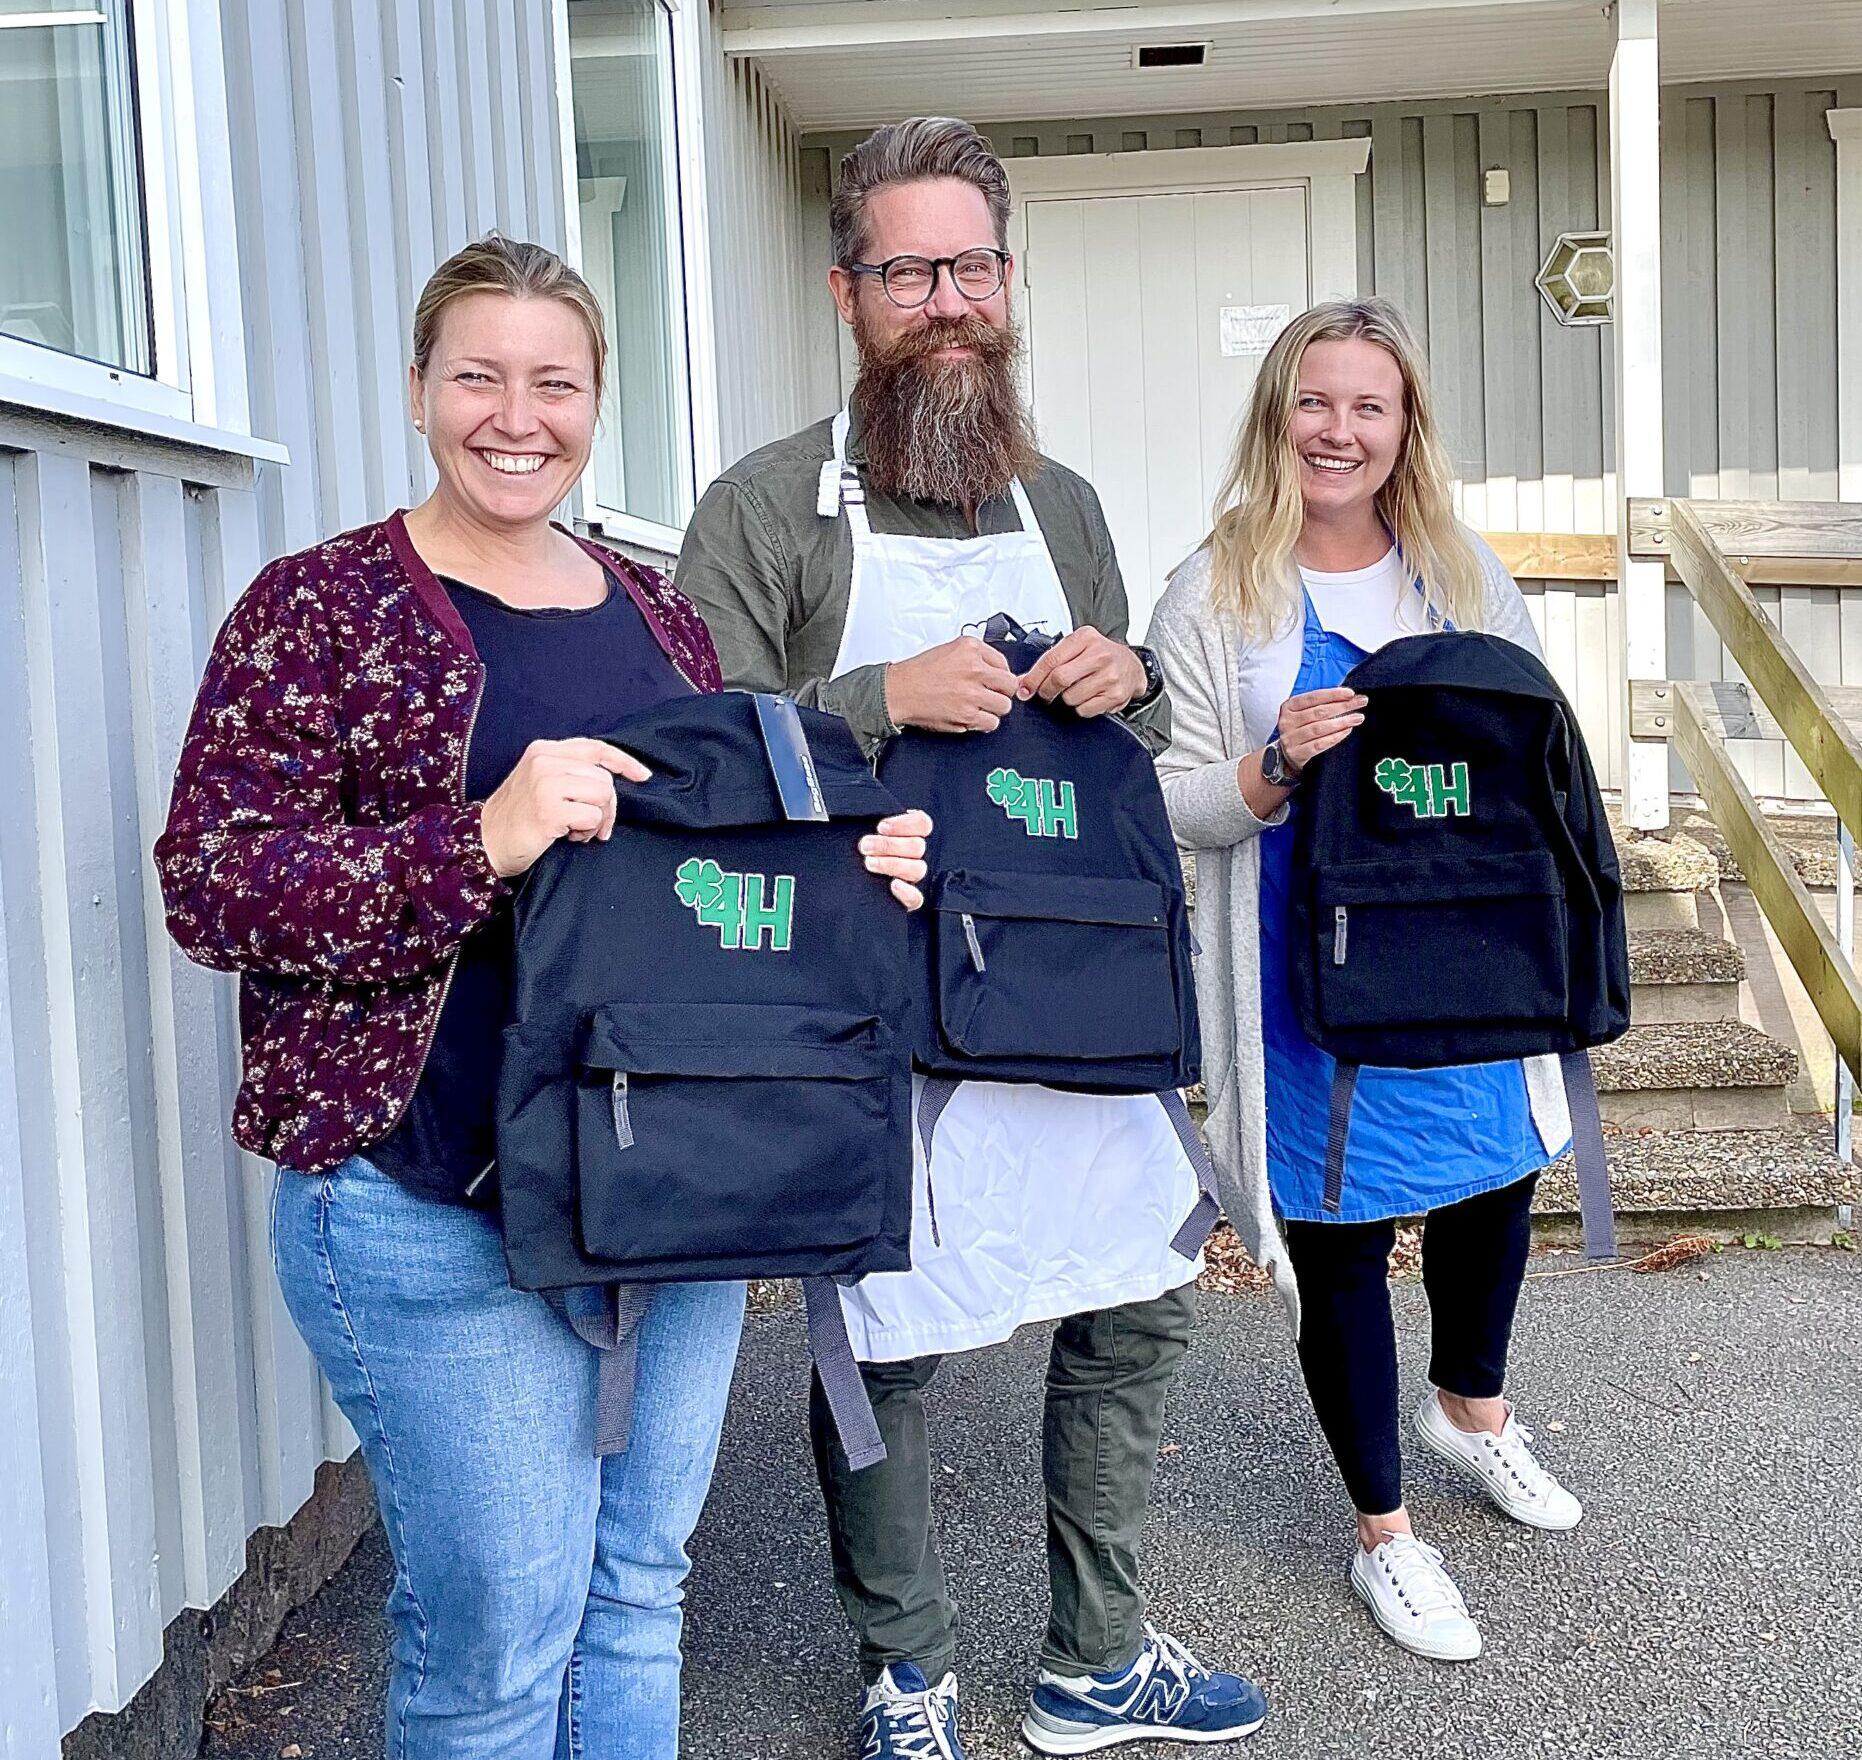 4H invigning - Susanne Thorsson, Henric Nilsson och Jenny Jönsson